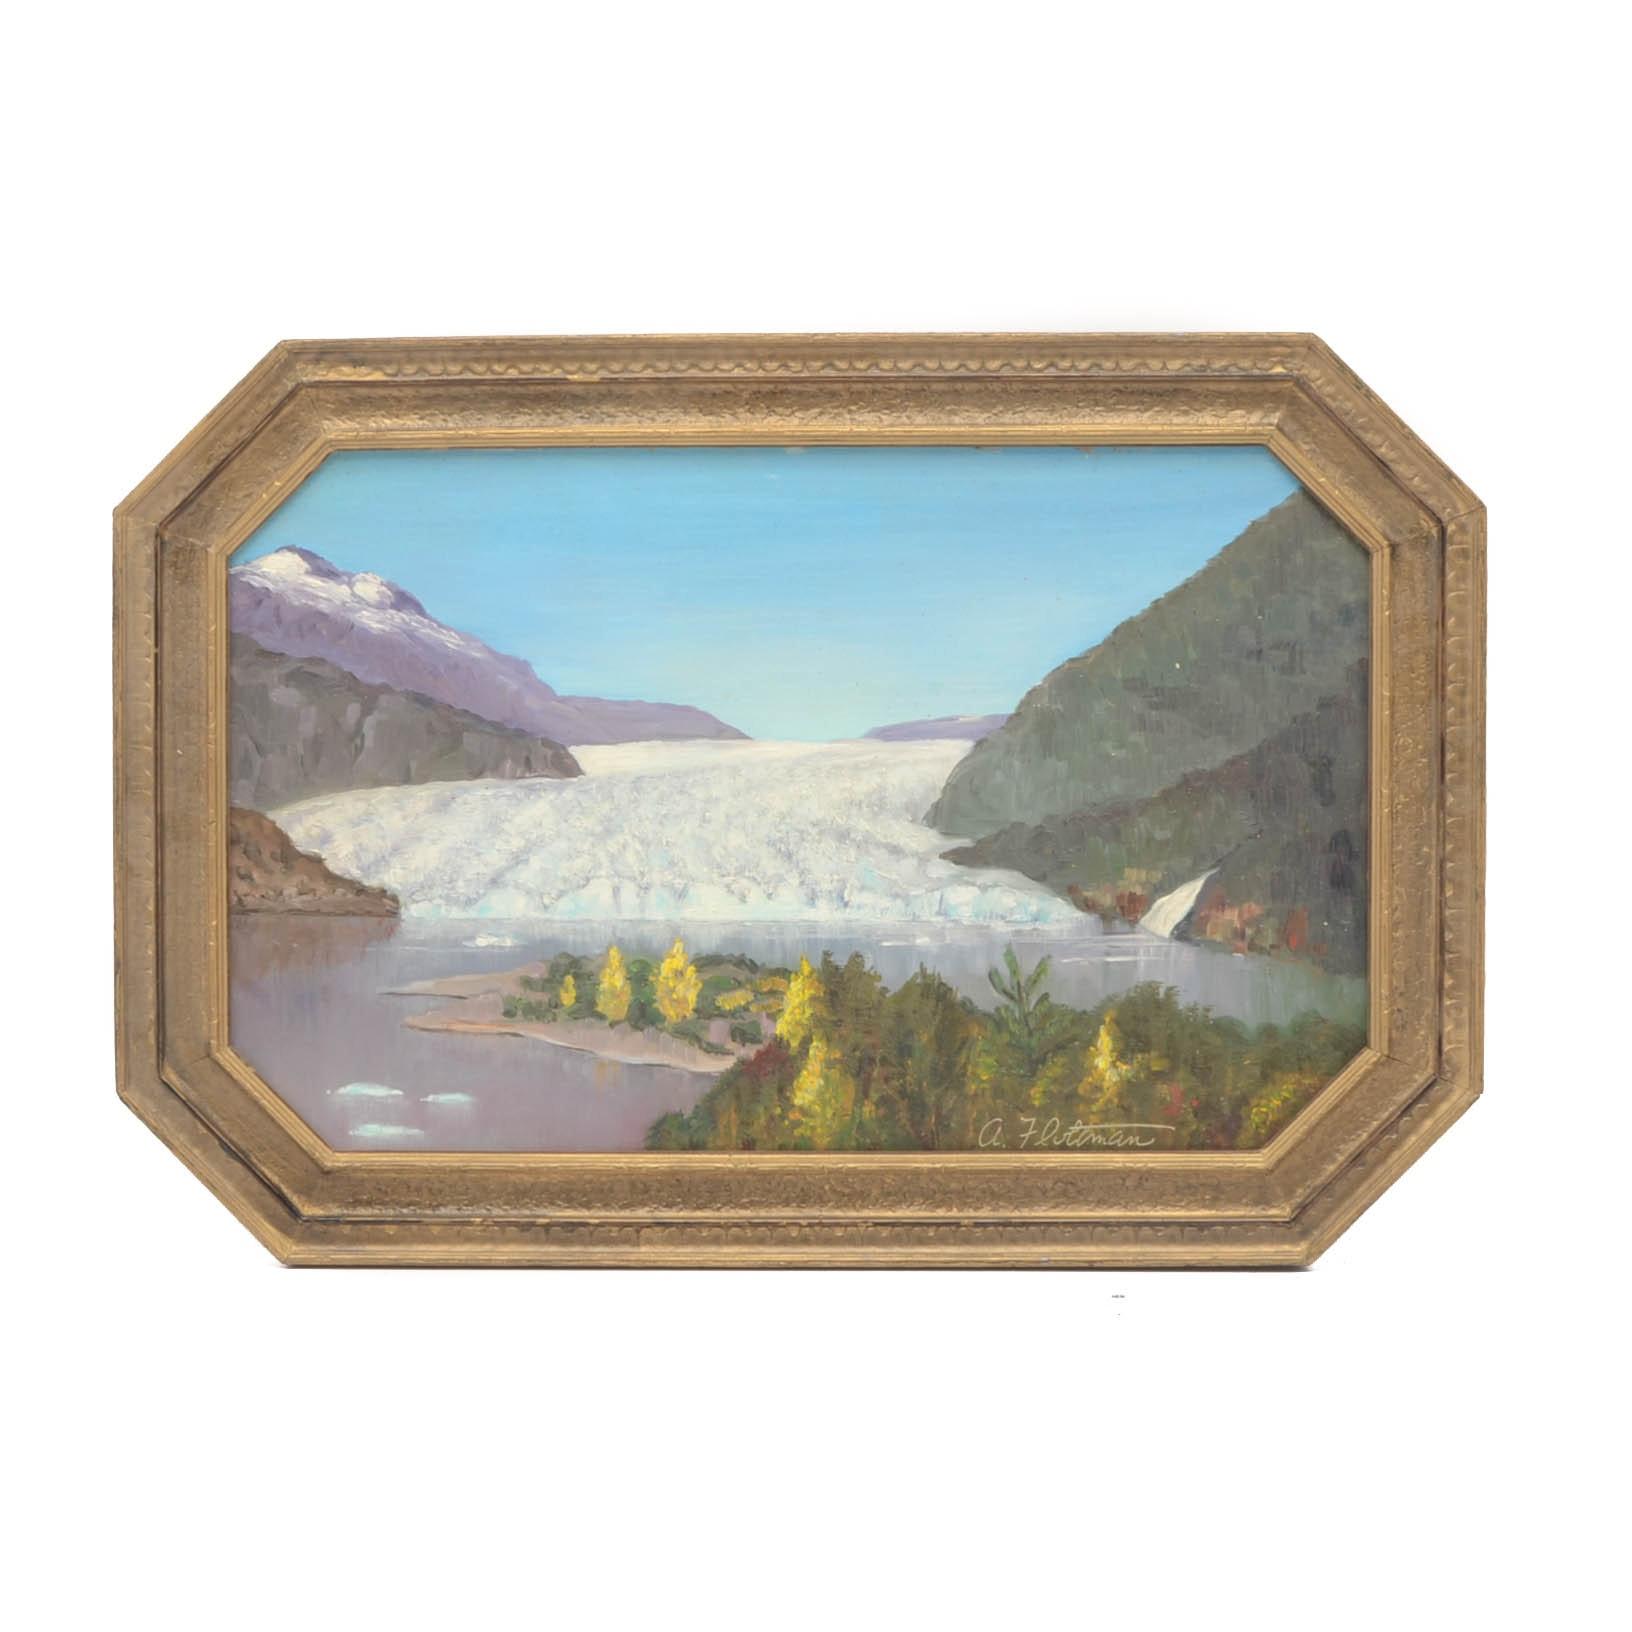 A. Fluttman Original Oil Painting on Masonite